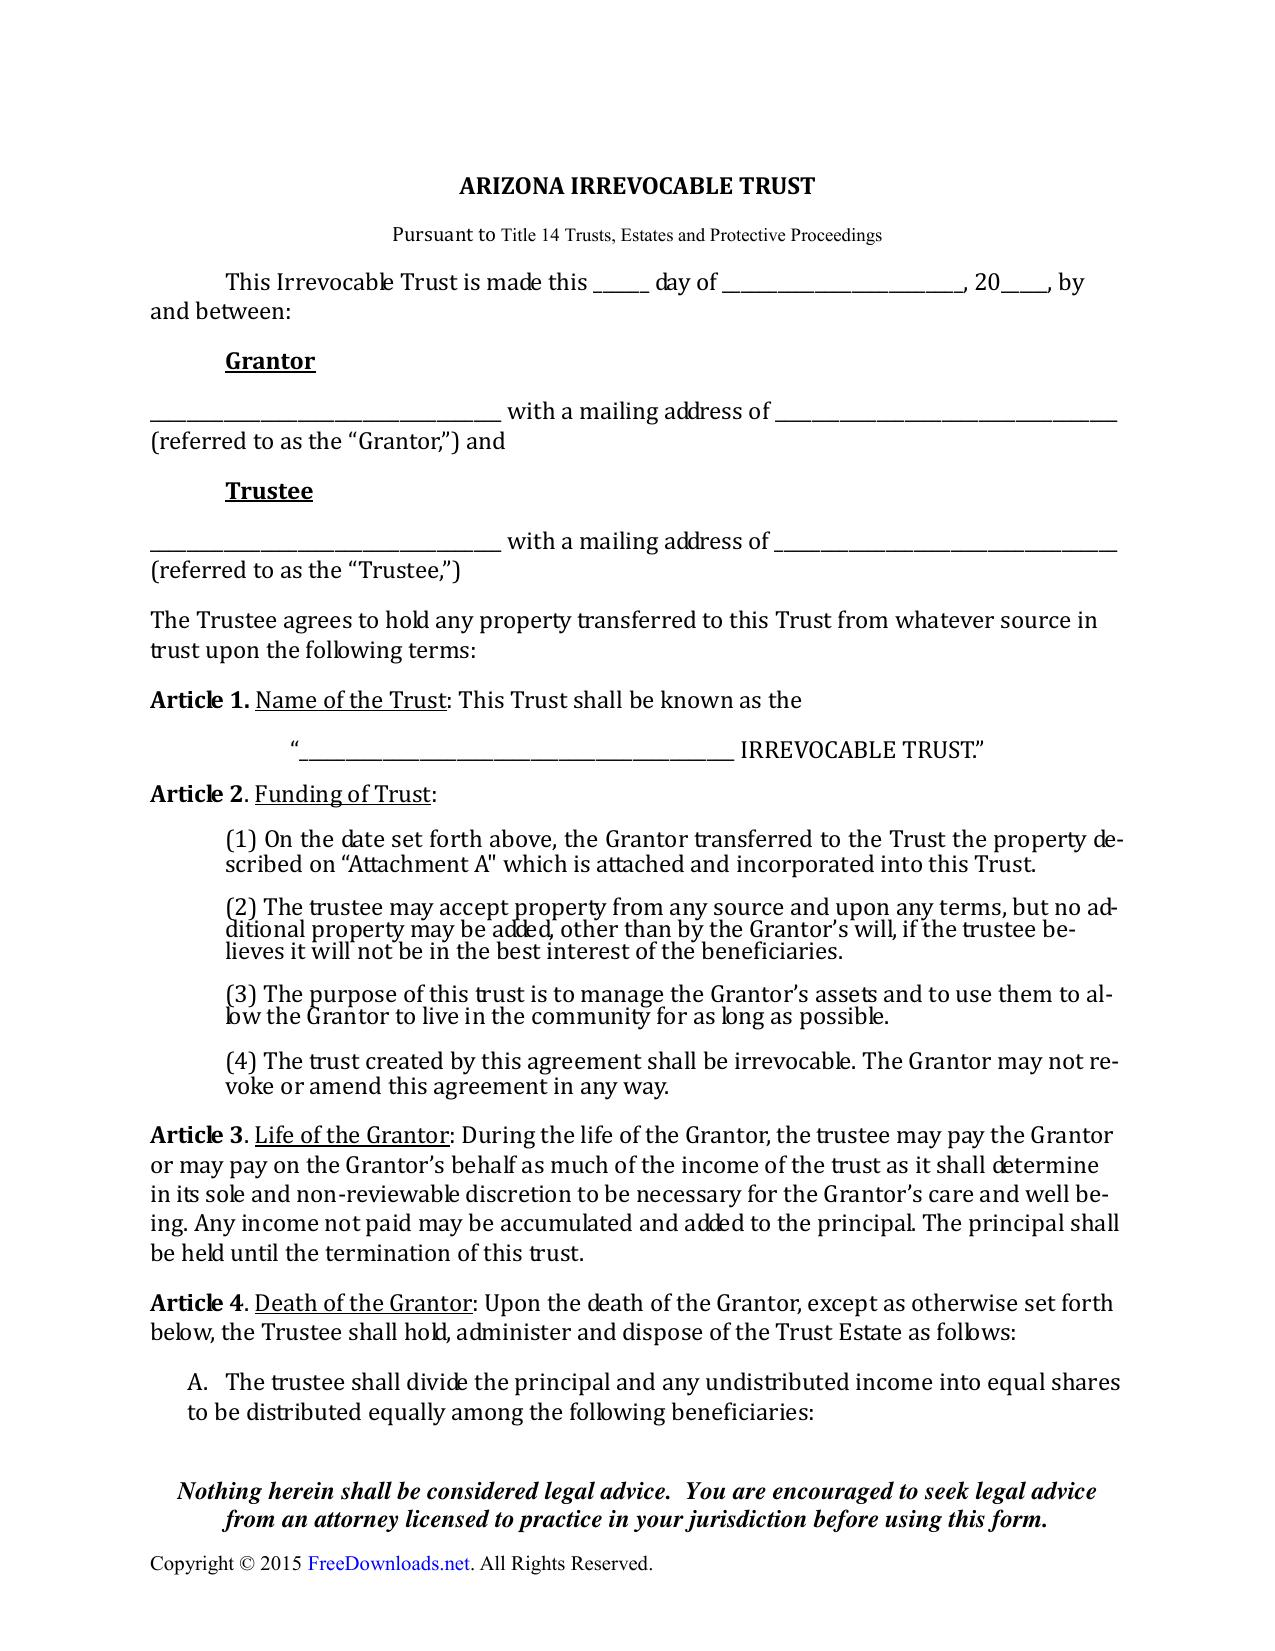 Irrevocable Trust Document